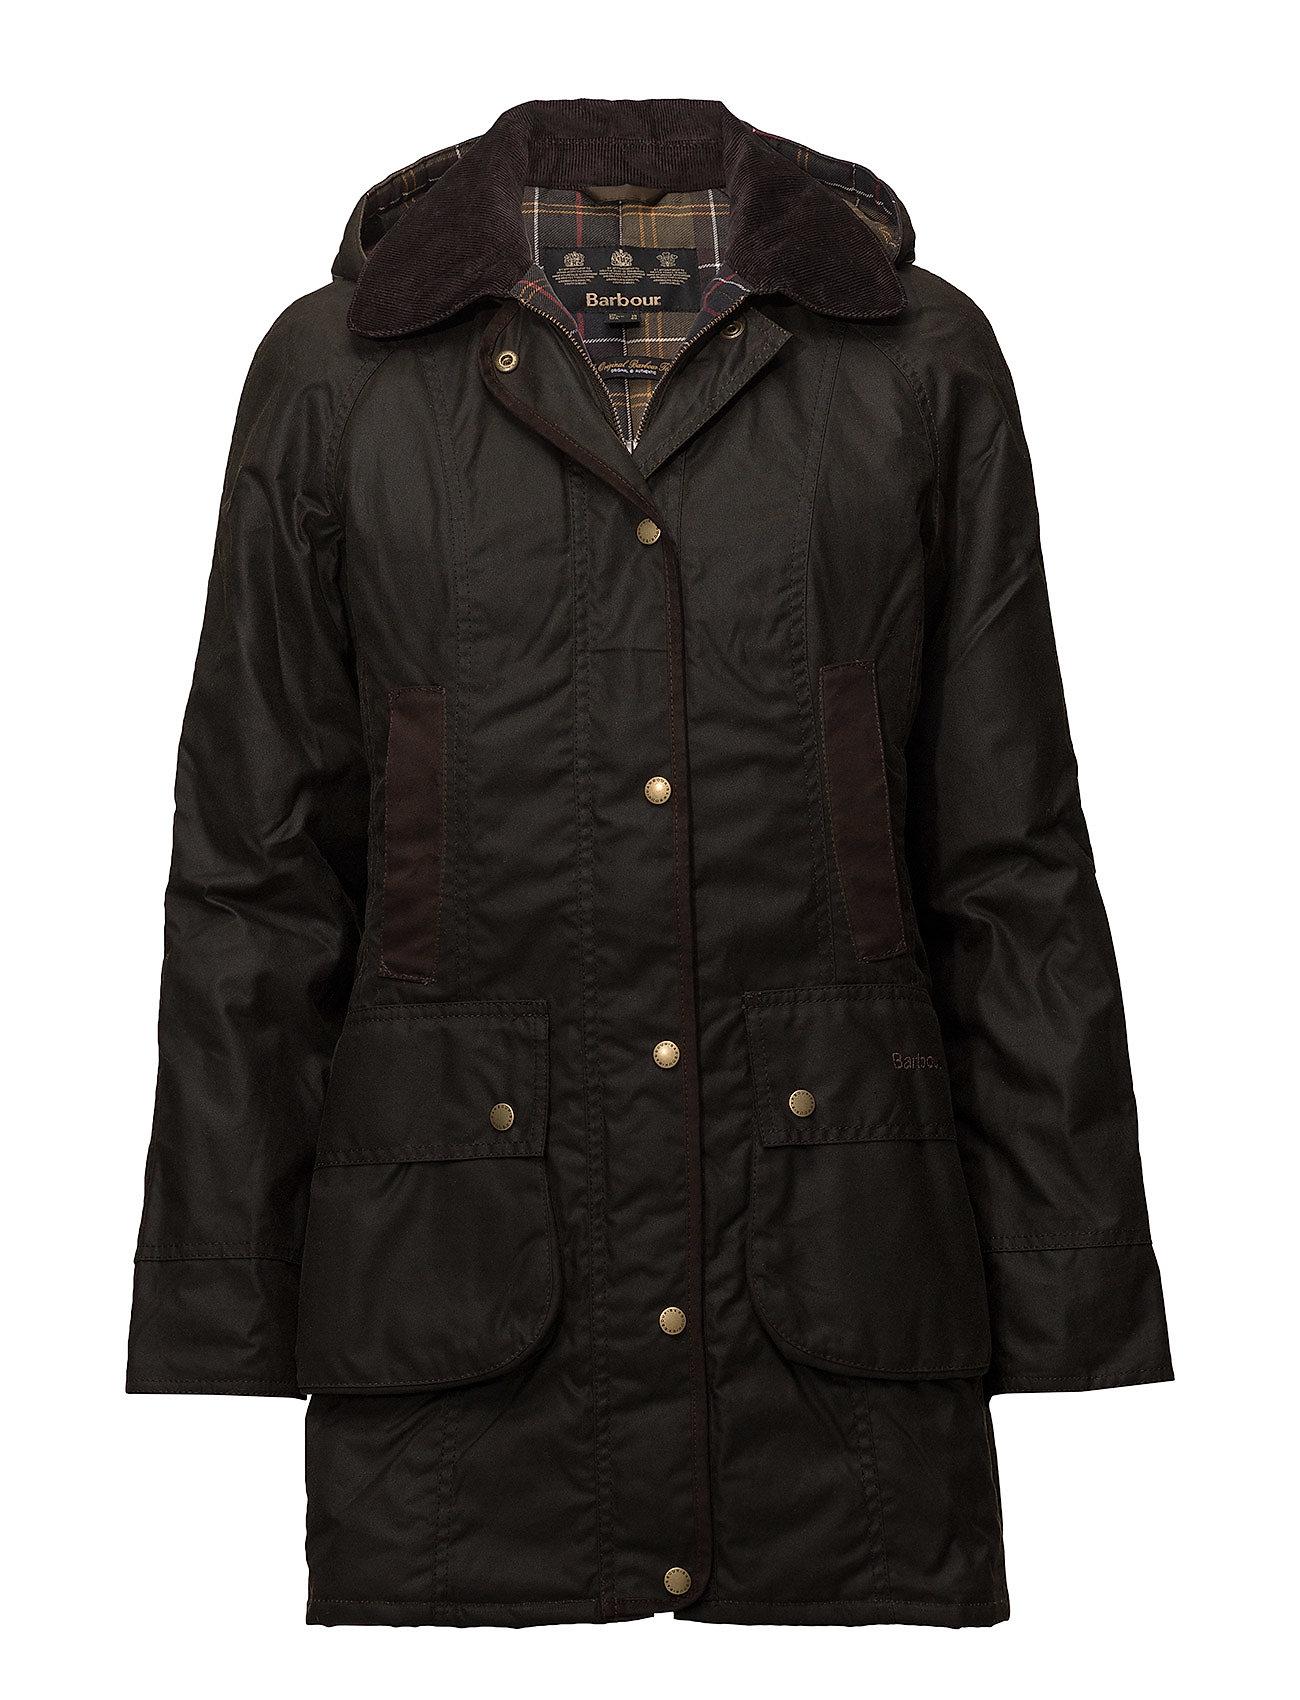 Barbour Barbour Bower Wax Jacket - OLIVE